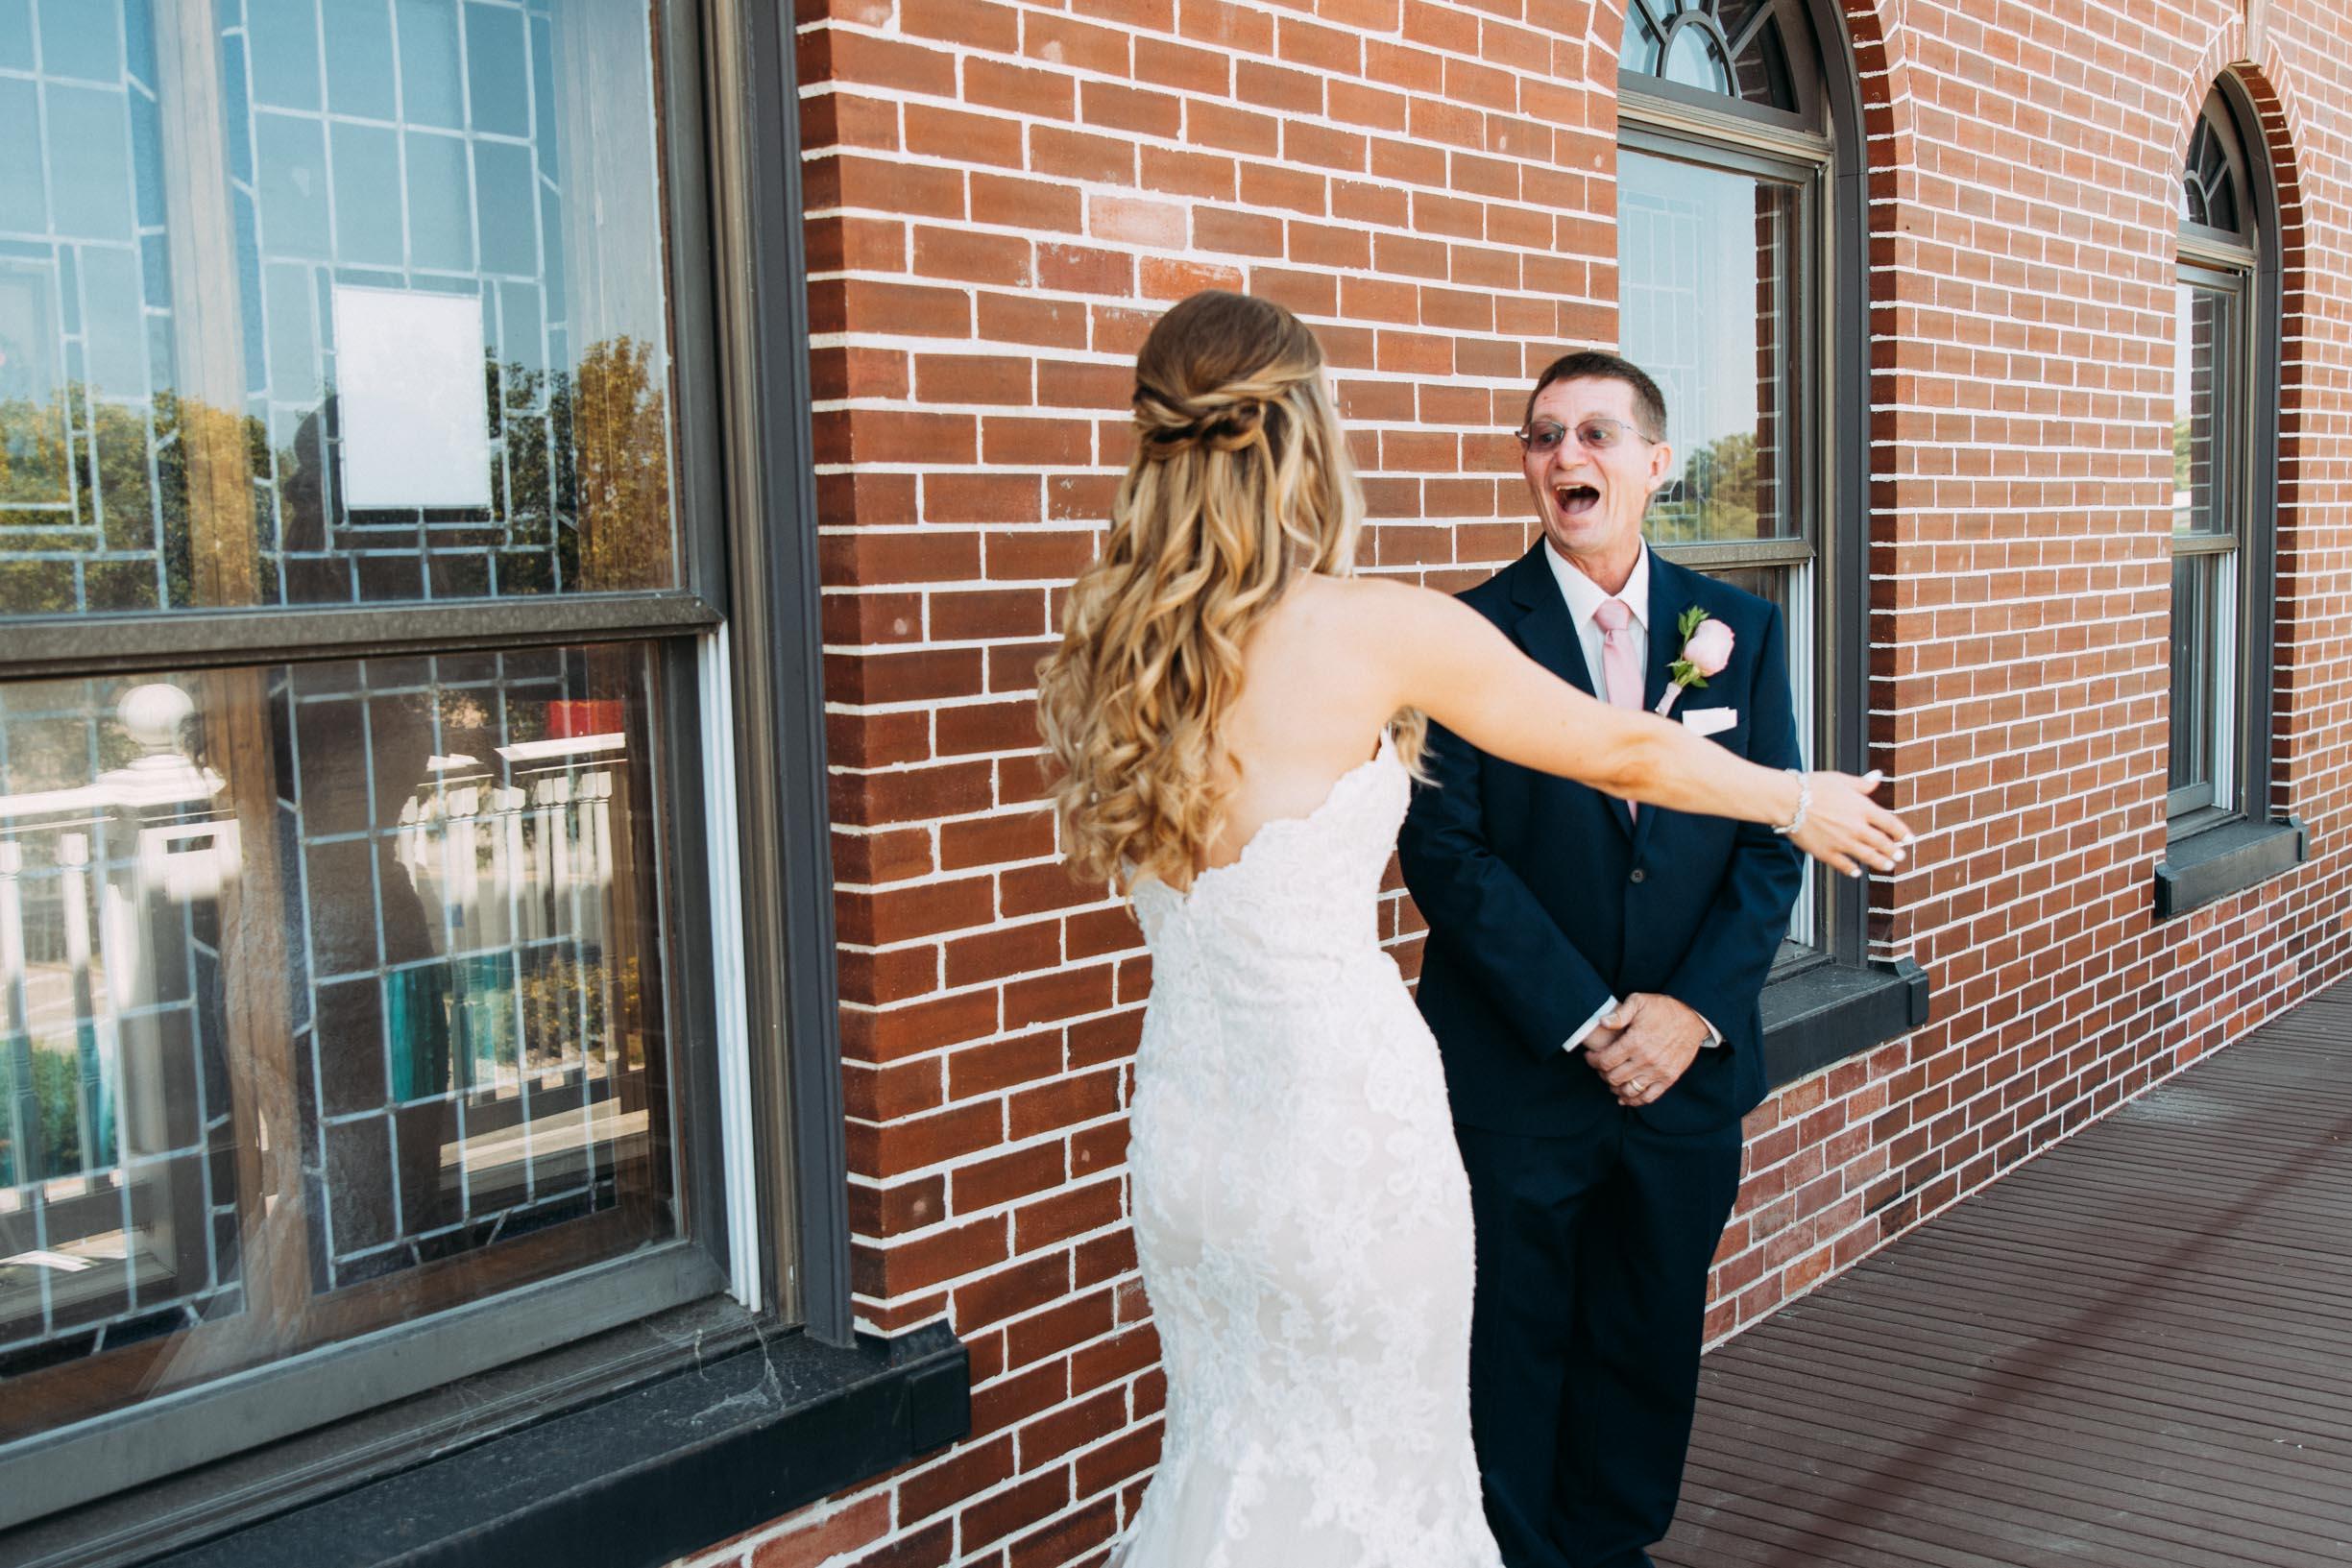 10-WeddingsattheBroz_Minnesota_WeddingBlog.jpg